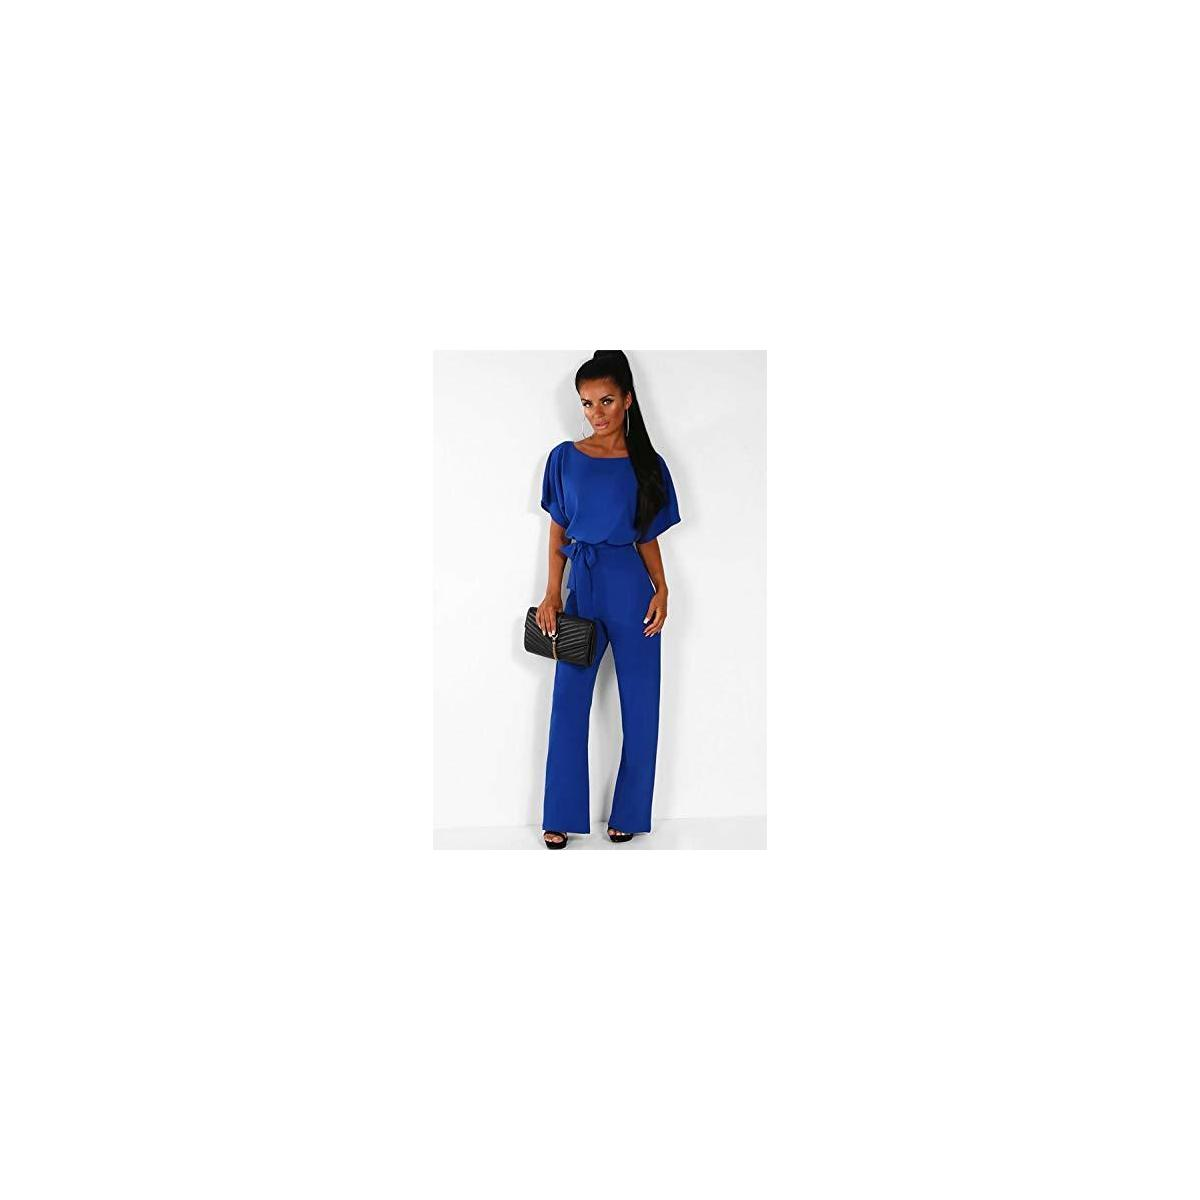 Women's Summer Short Sleeves Elegant Playsuit Wide Leg Jumpsuit Romper Belted